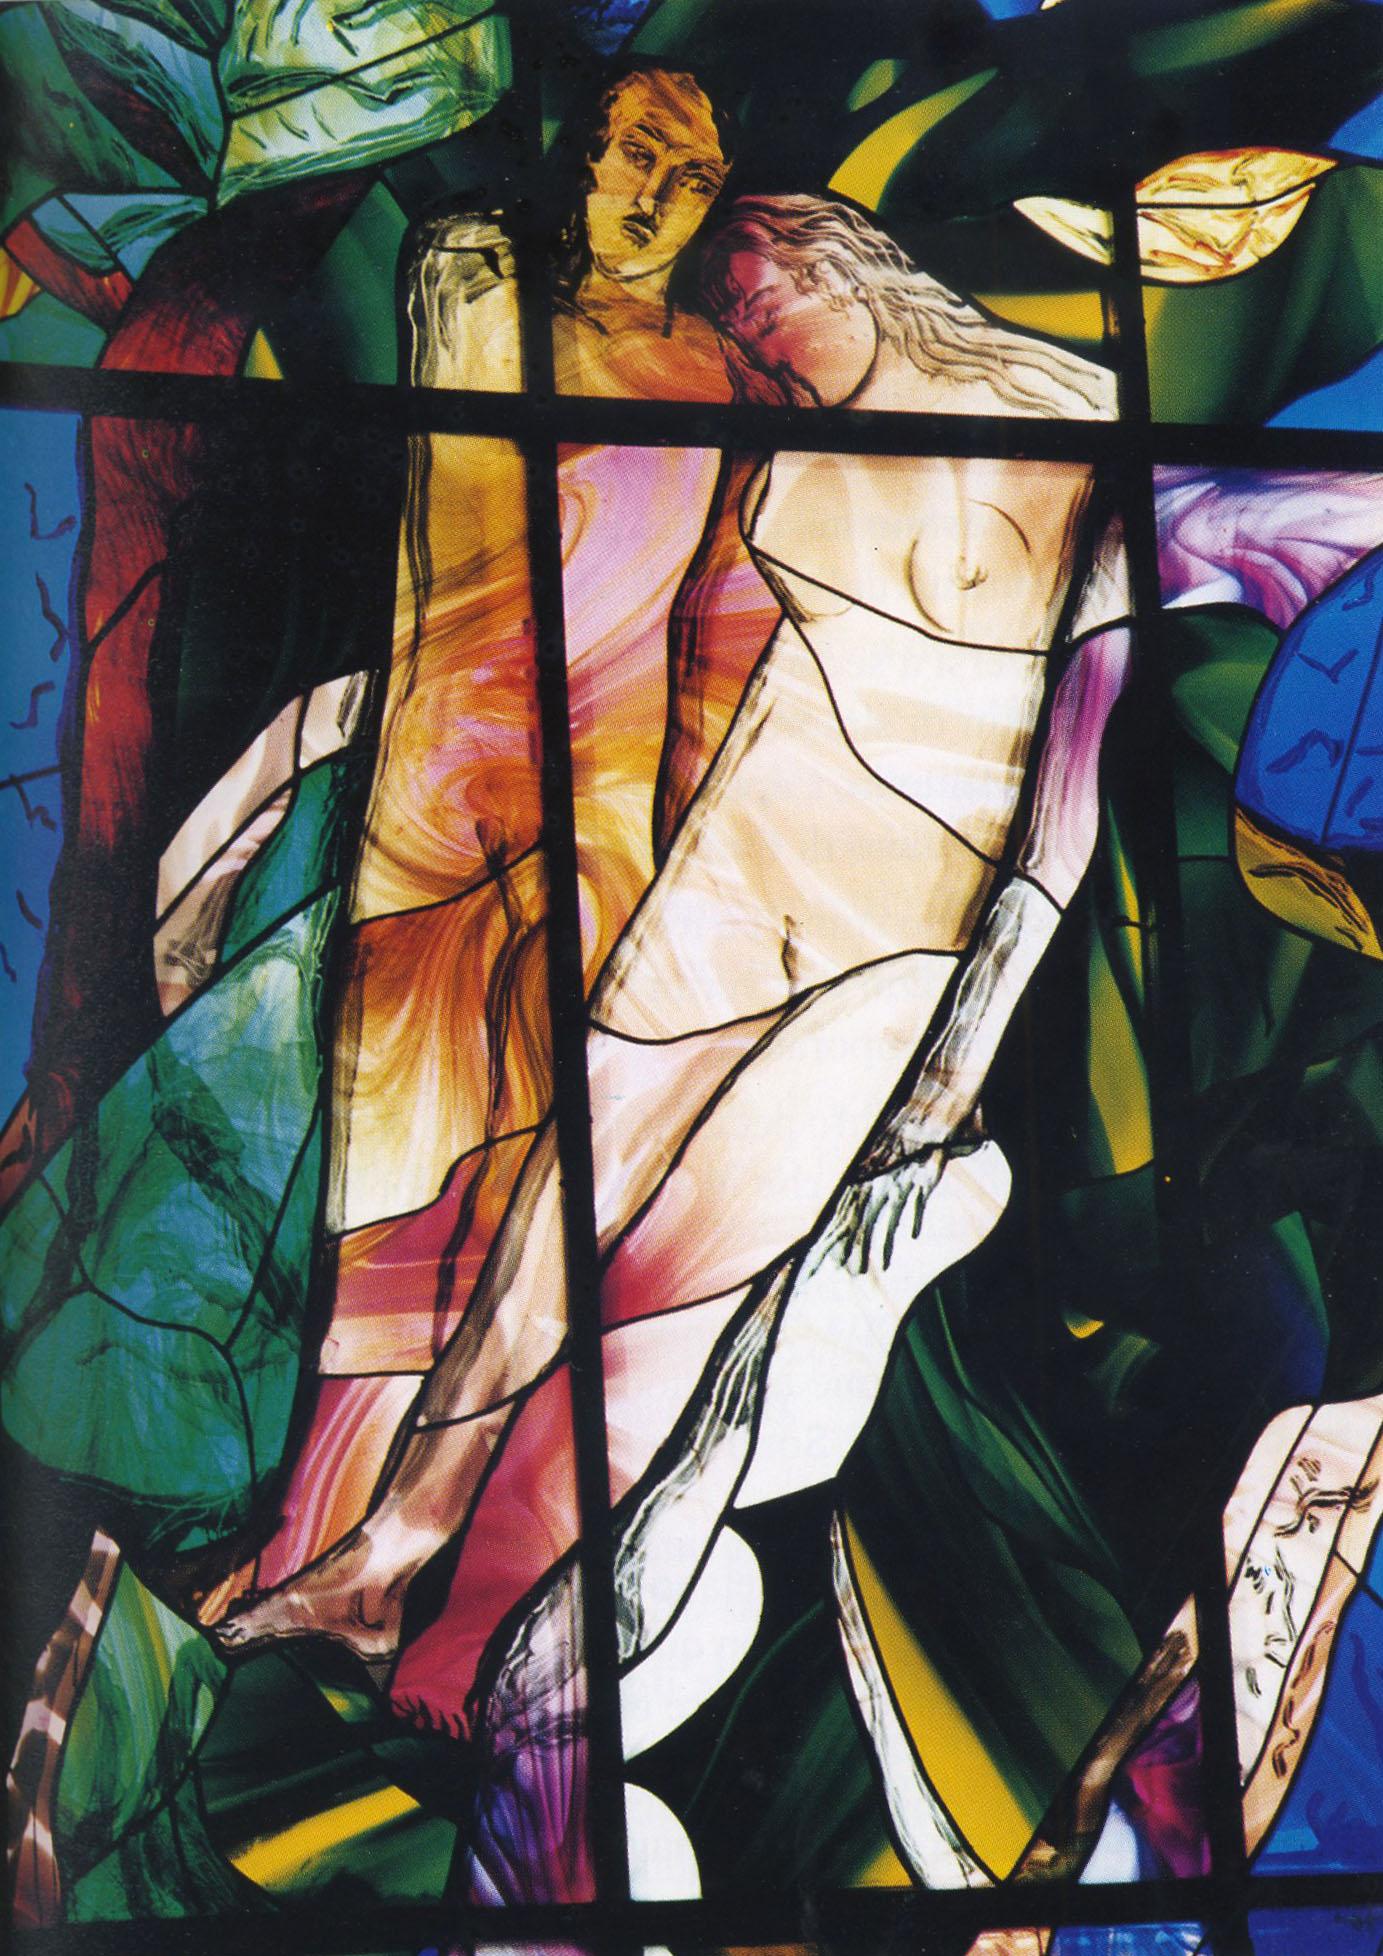 Franco Nocera - La Creazione, Adamo ed Eva